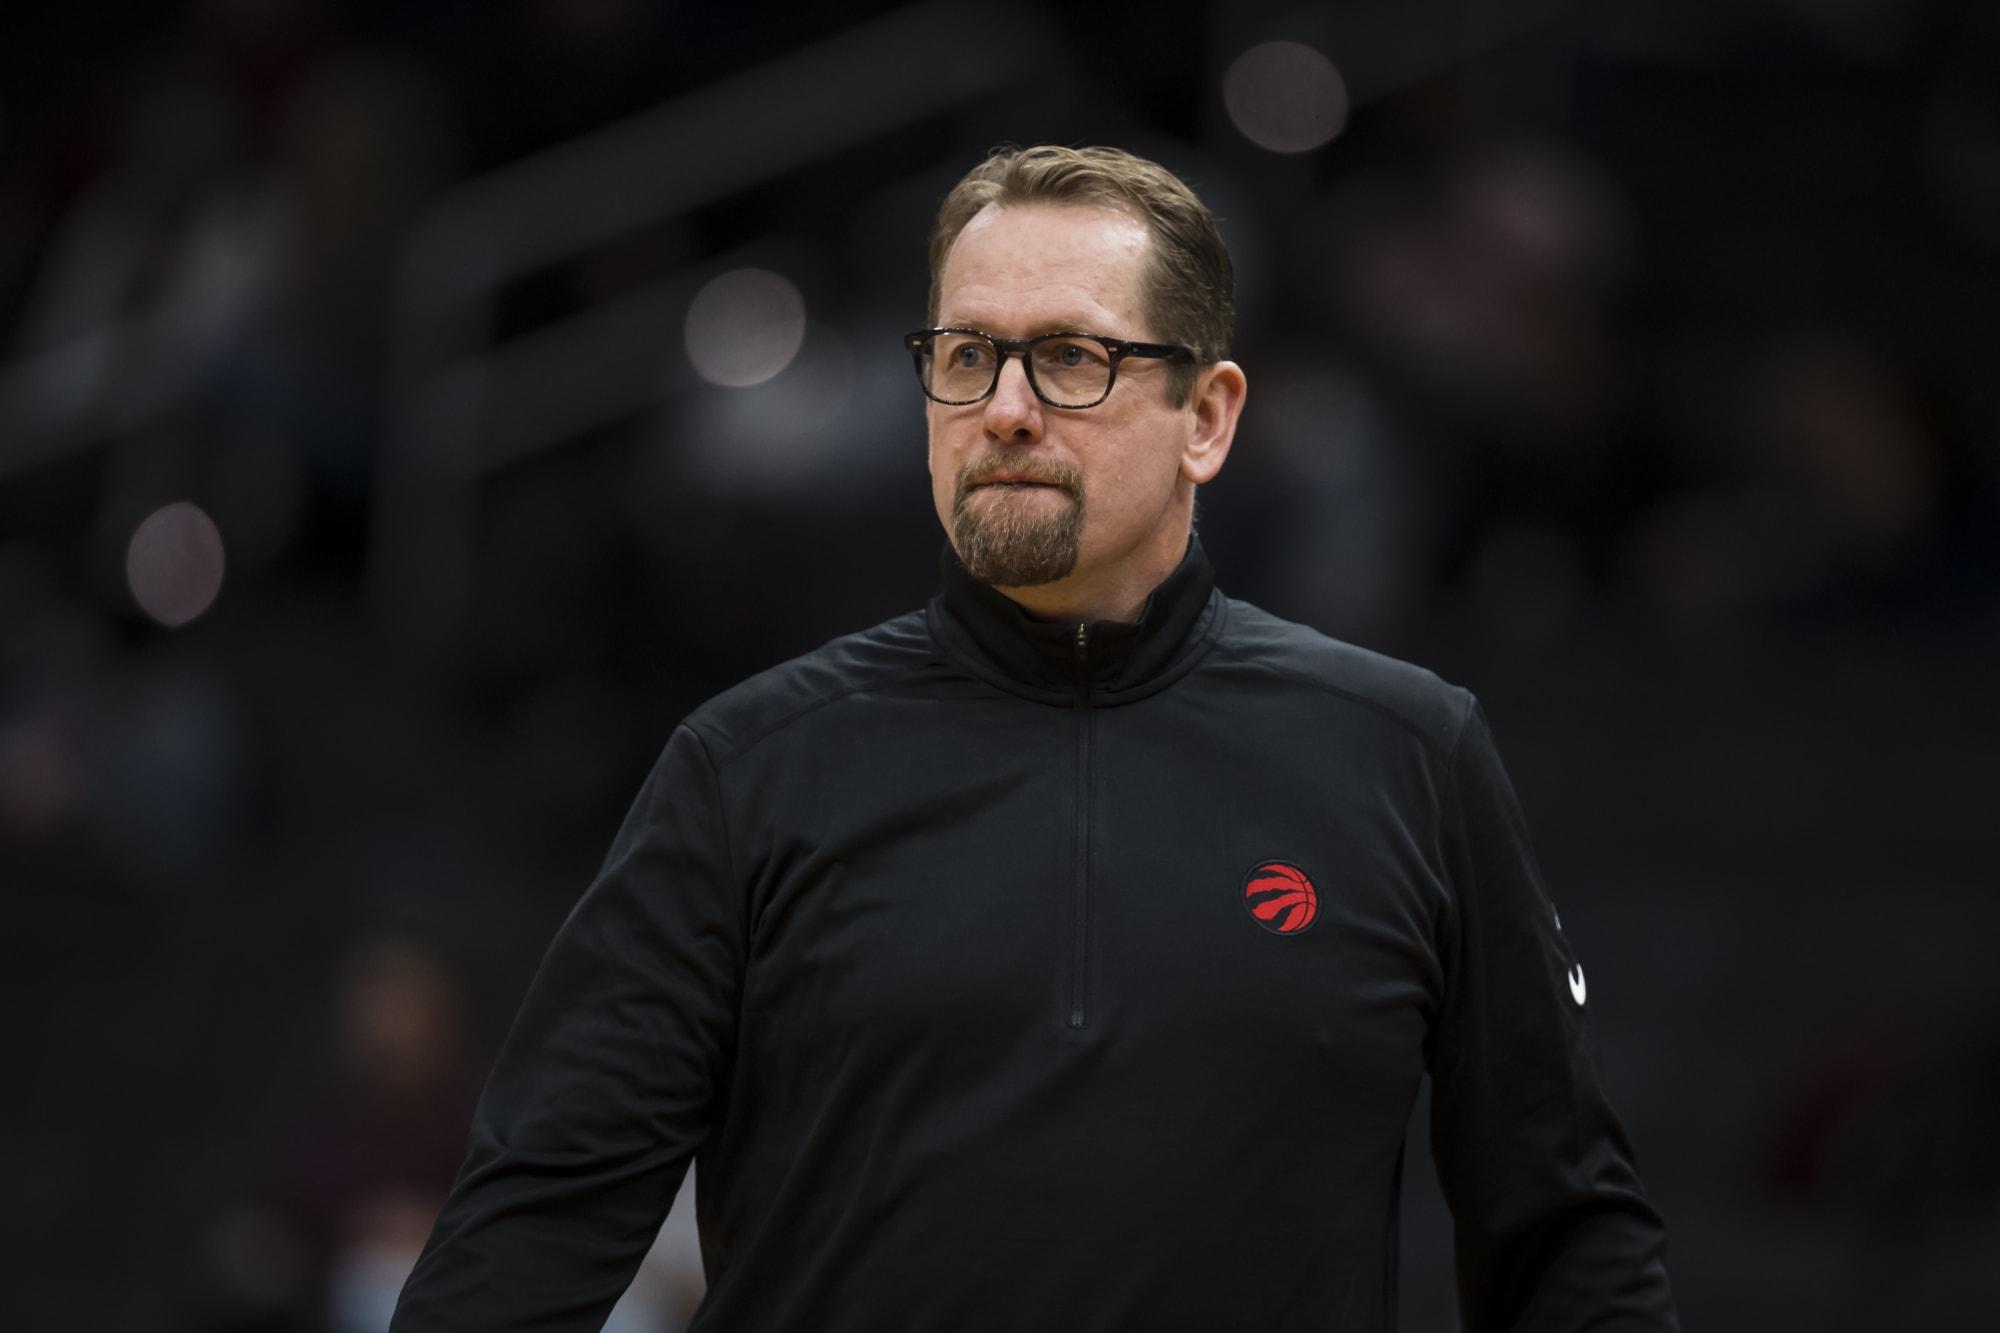 Toronto Raptors: 1 stud and 1 dud from tough loss to Bulls